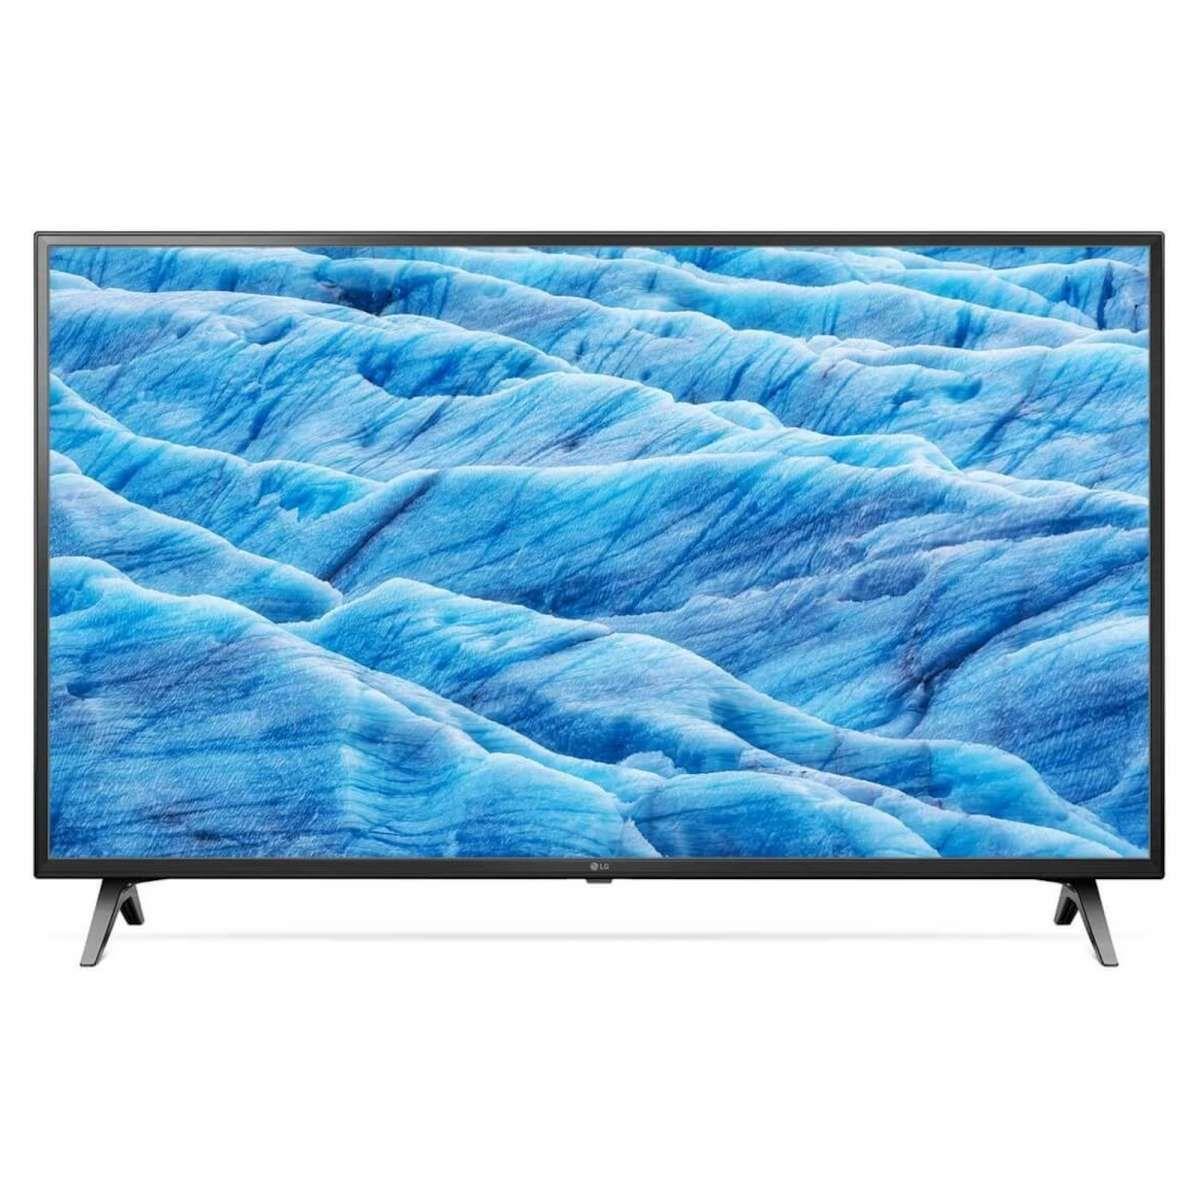 "LG 55UM7100PLB 55"" 4K Ultra HD Smart HDR LED TV £379 @ Hughes"